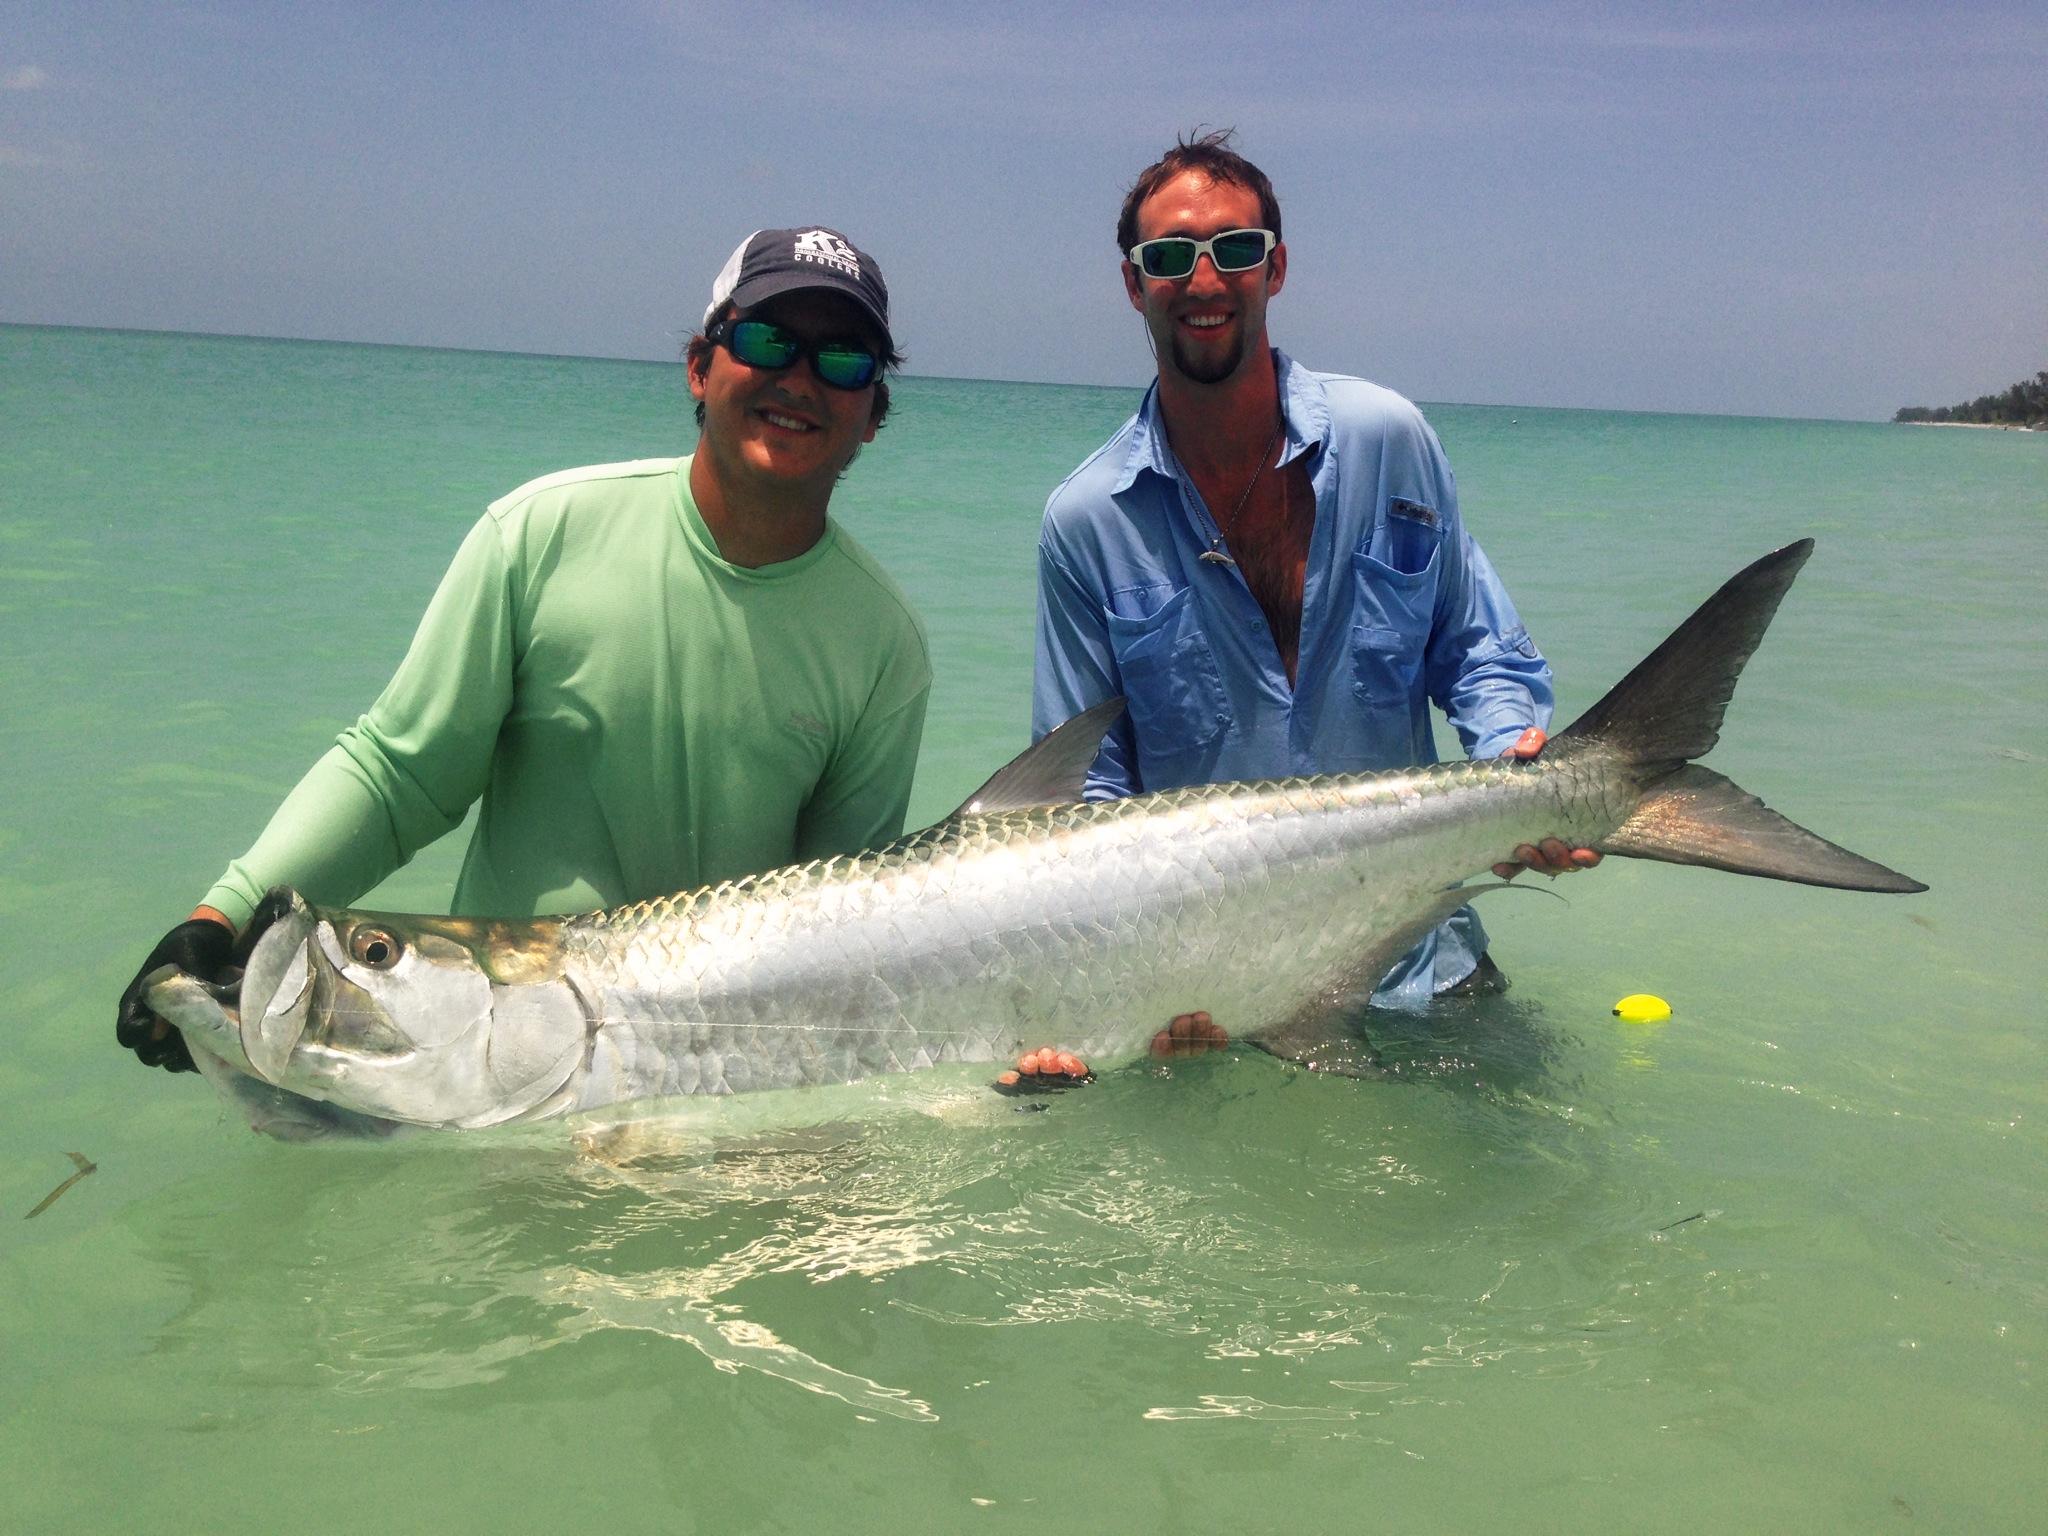 Tarpon fishing southwest florida beaches hobie for Fishing jobs in florida